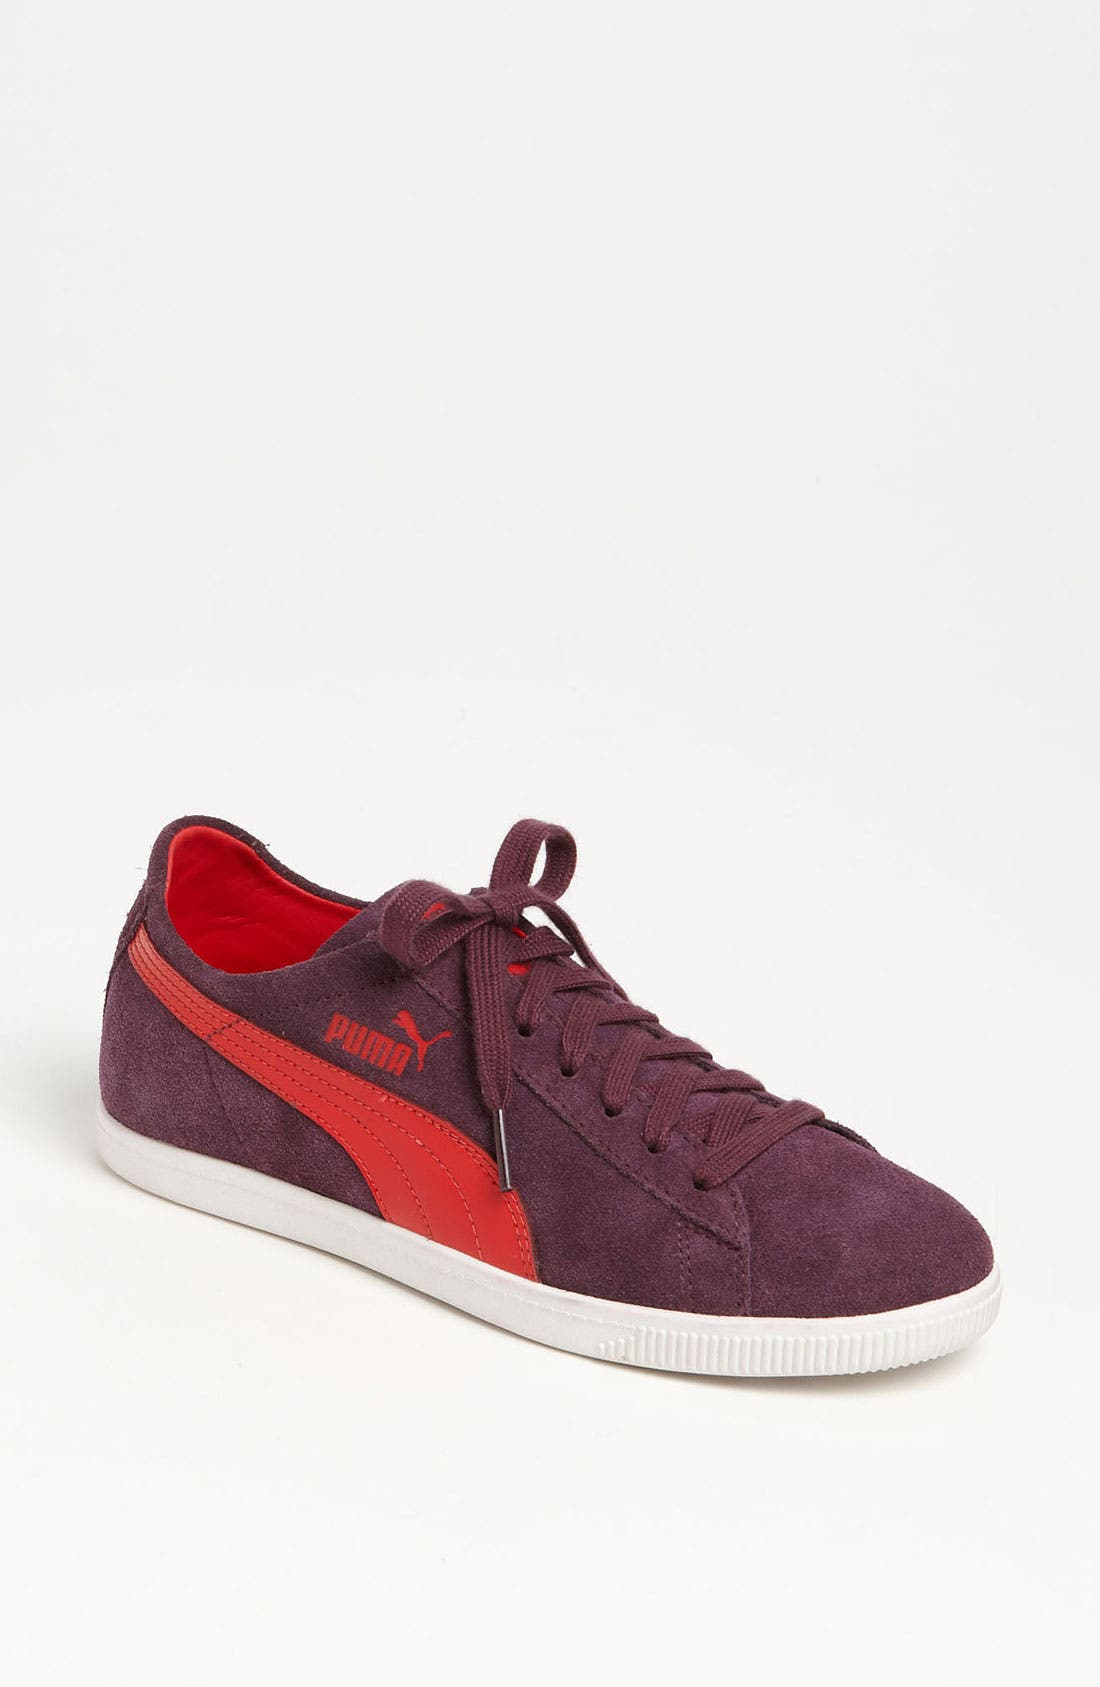 Main Image - PUMA 'Glyde Lo' Sneaker (Women)